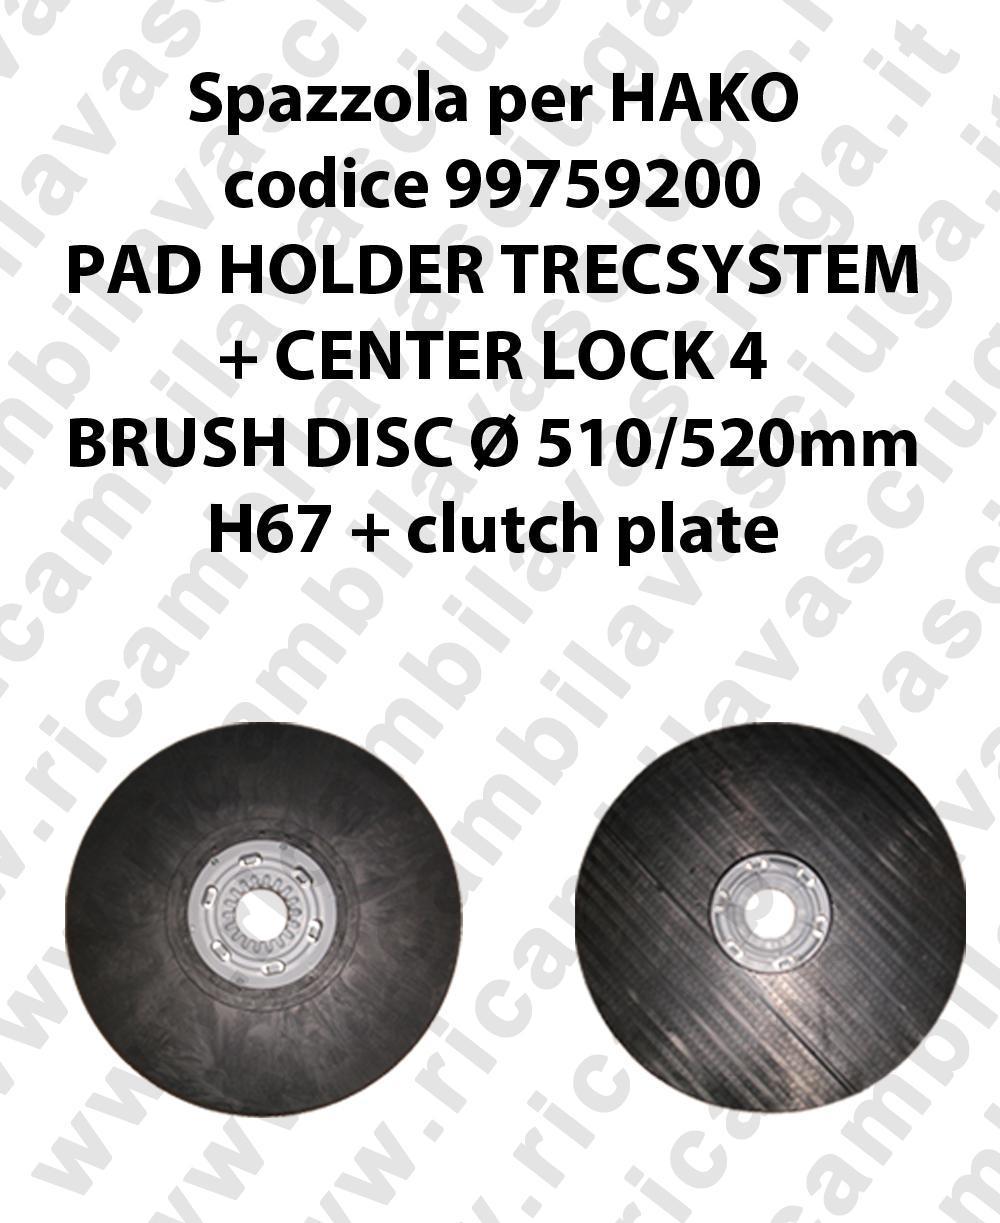 PAD HOLDER TRECSYSTEM  pour autolaveuses HAKO code 99759200